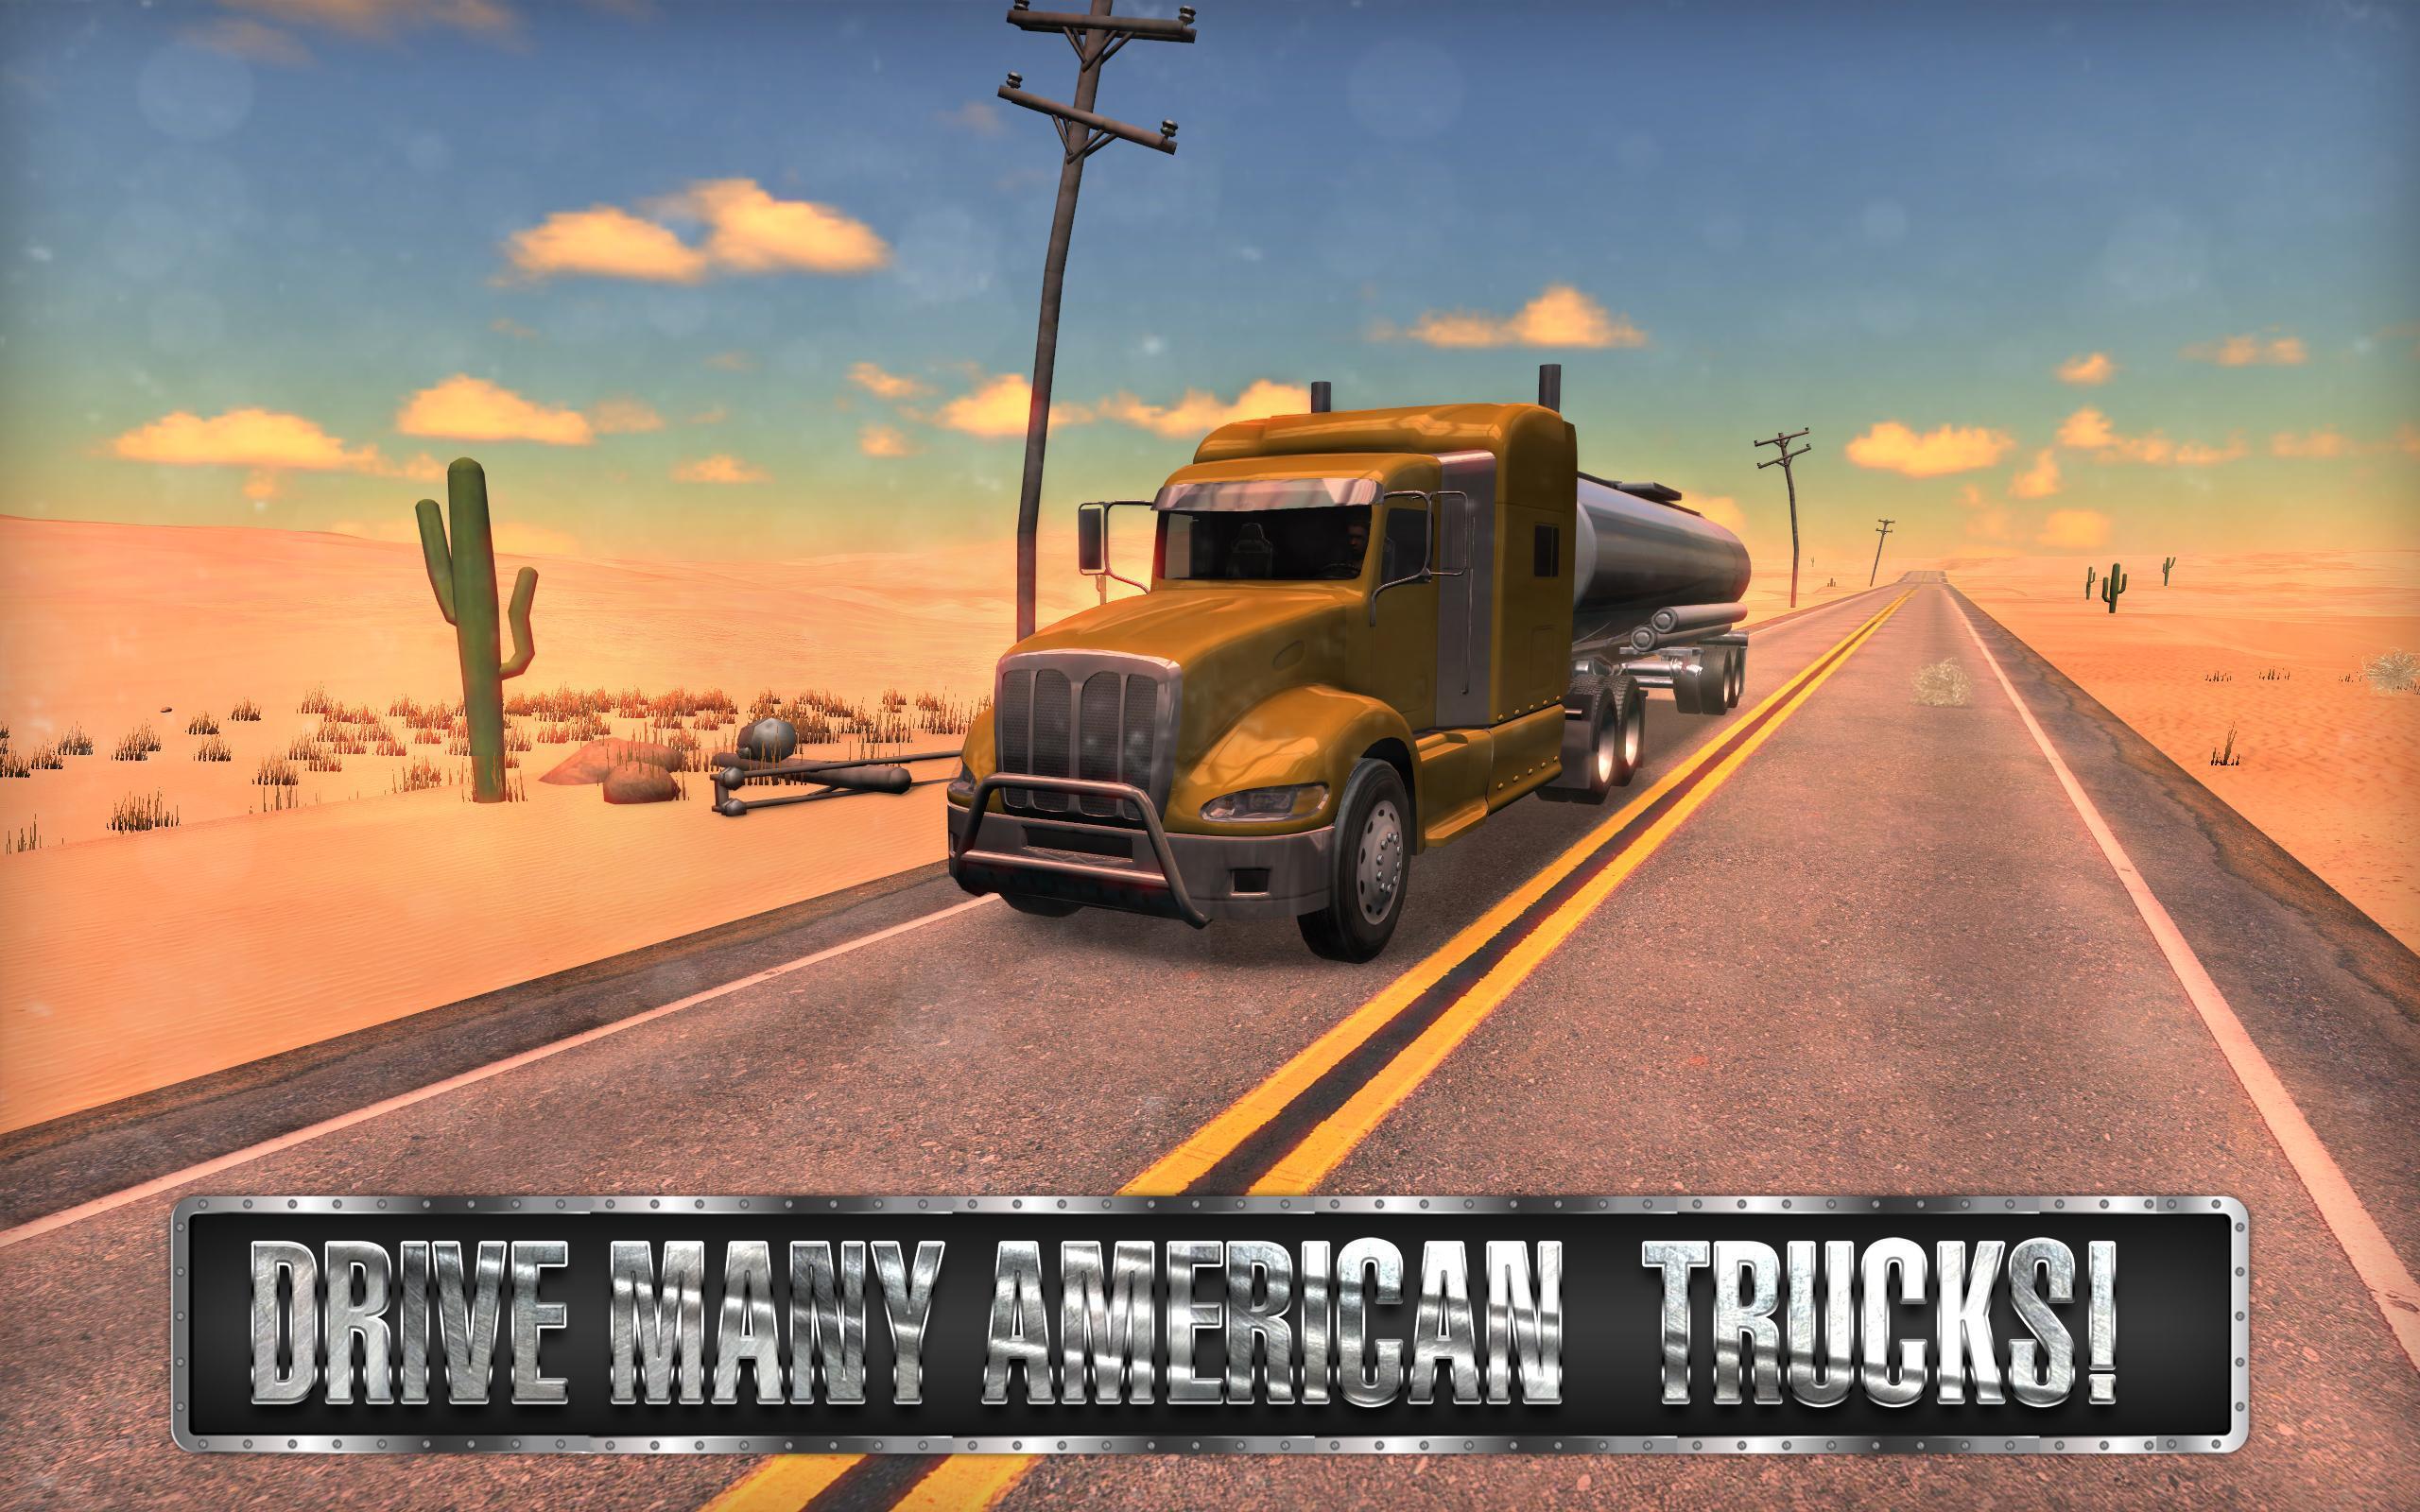 Android Için Truck Simulator Usa - Apk'yı İndir à Jeux De Tir 2